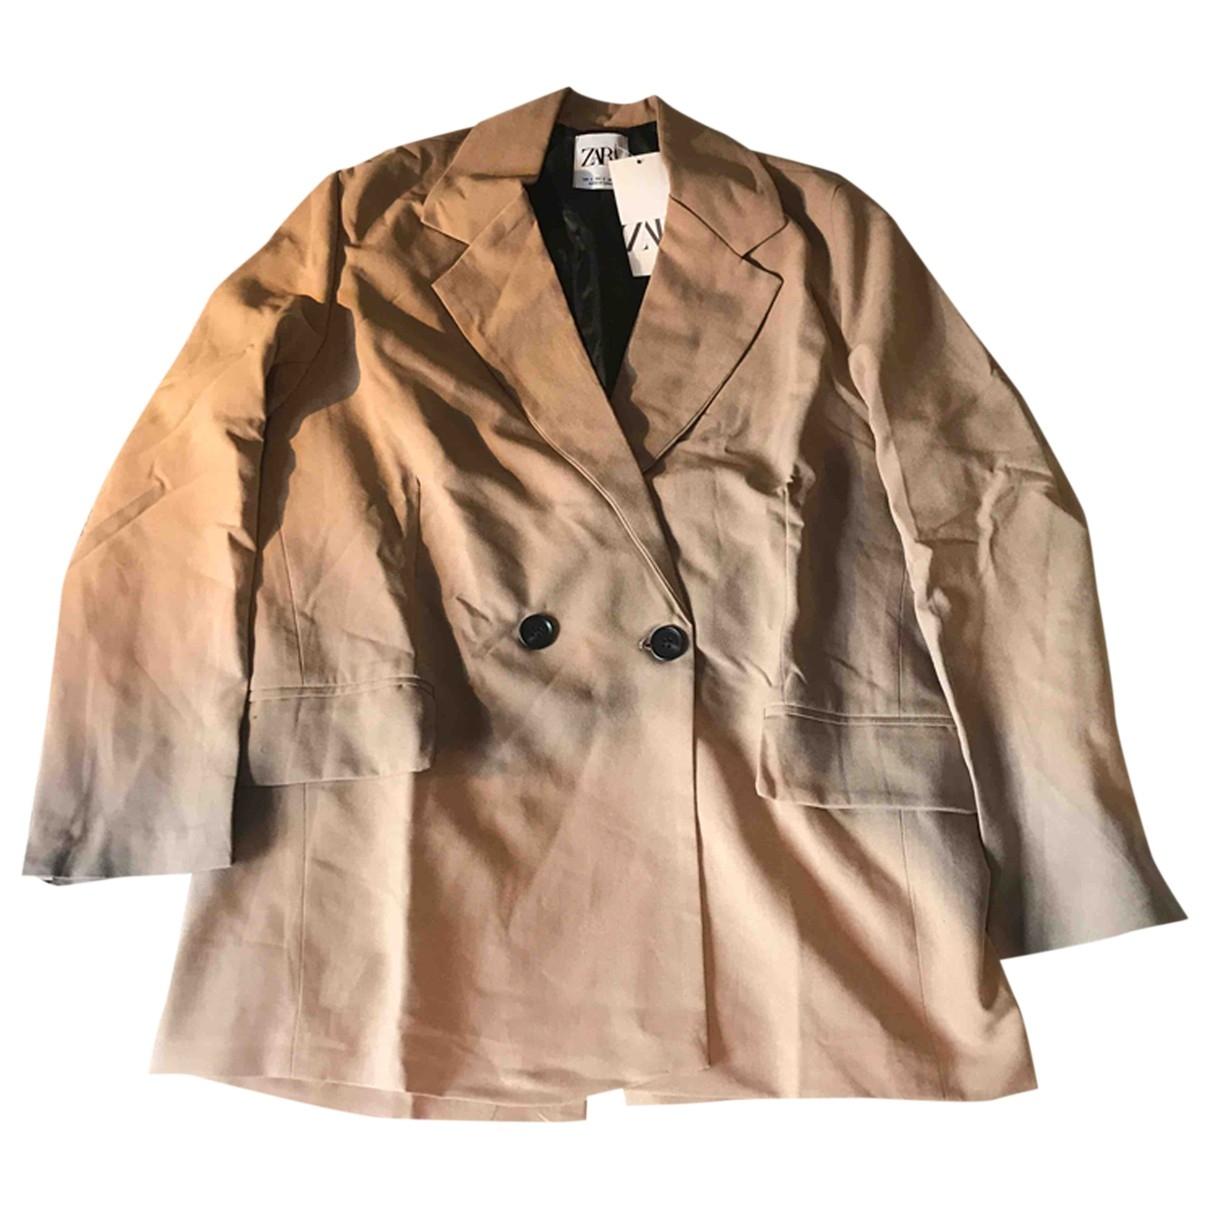 Zara \N Beige Cotton jacket for Women S International